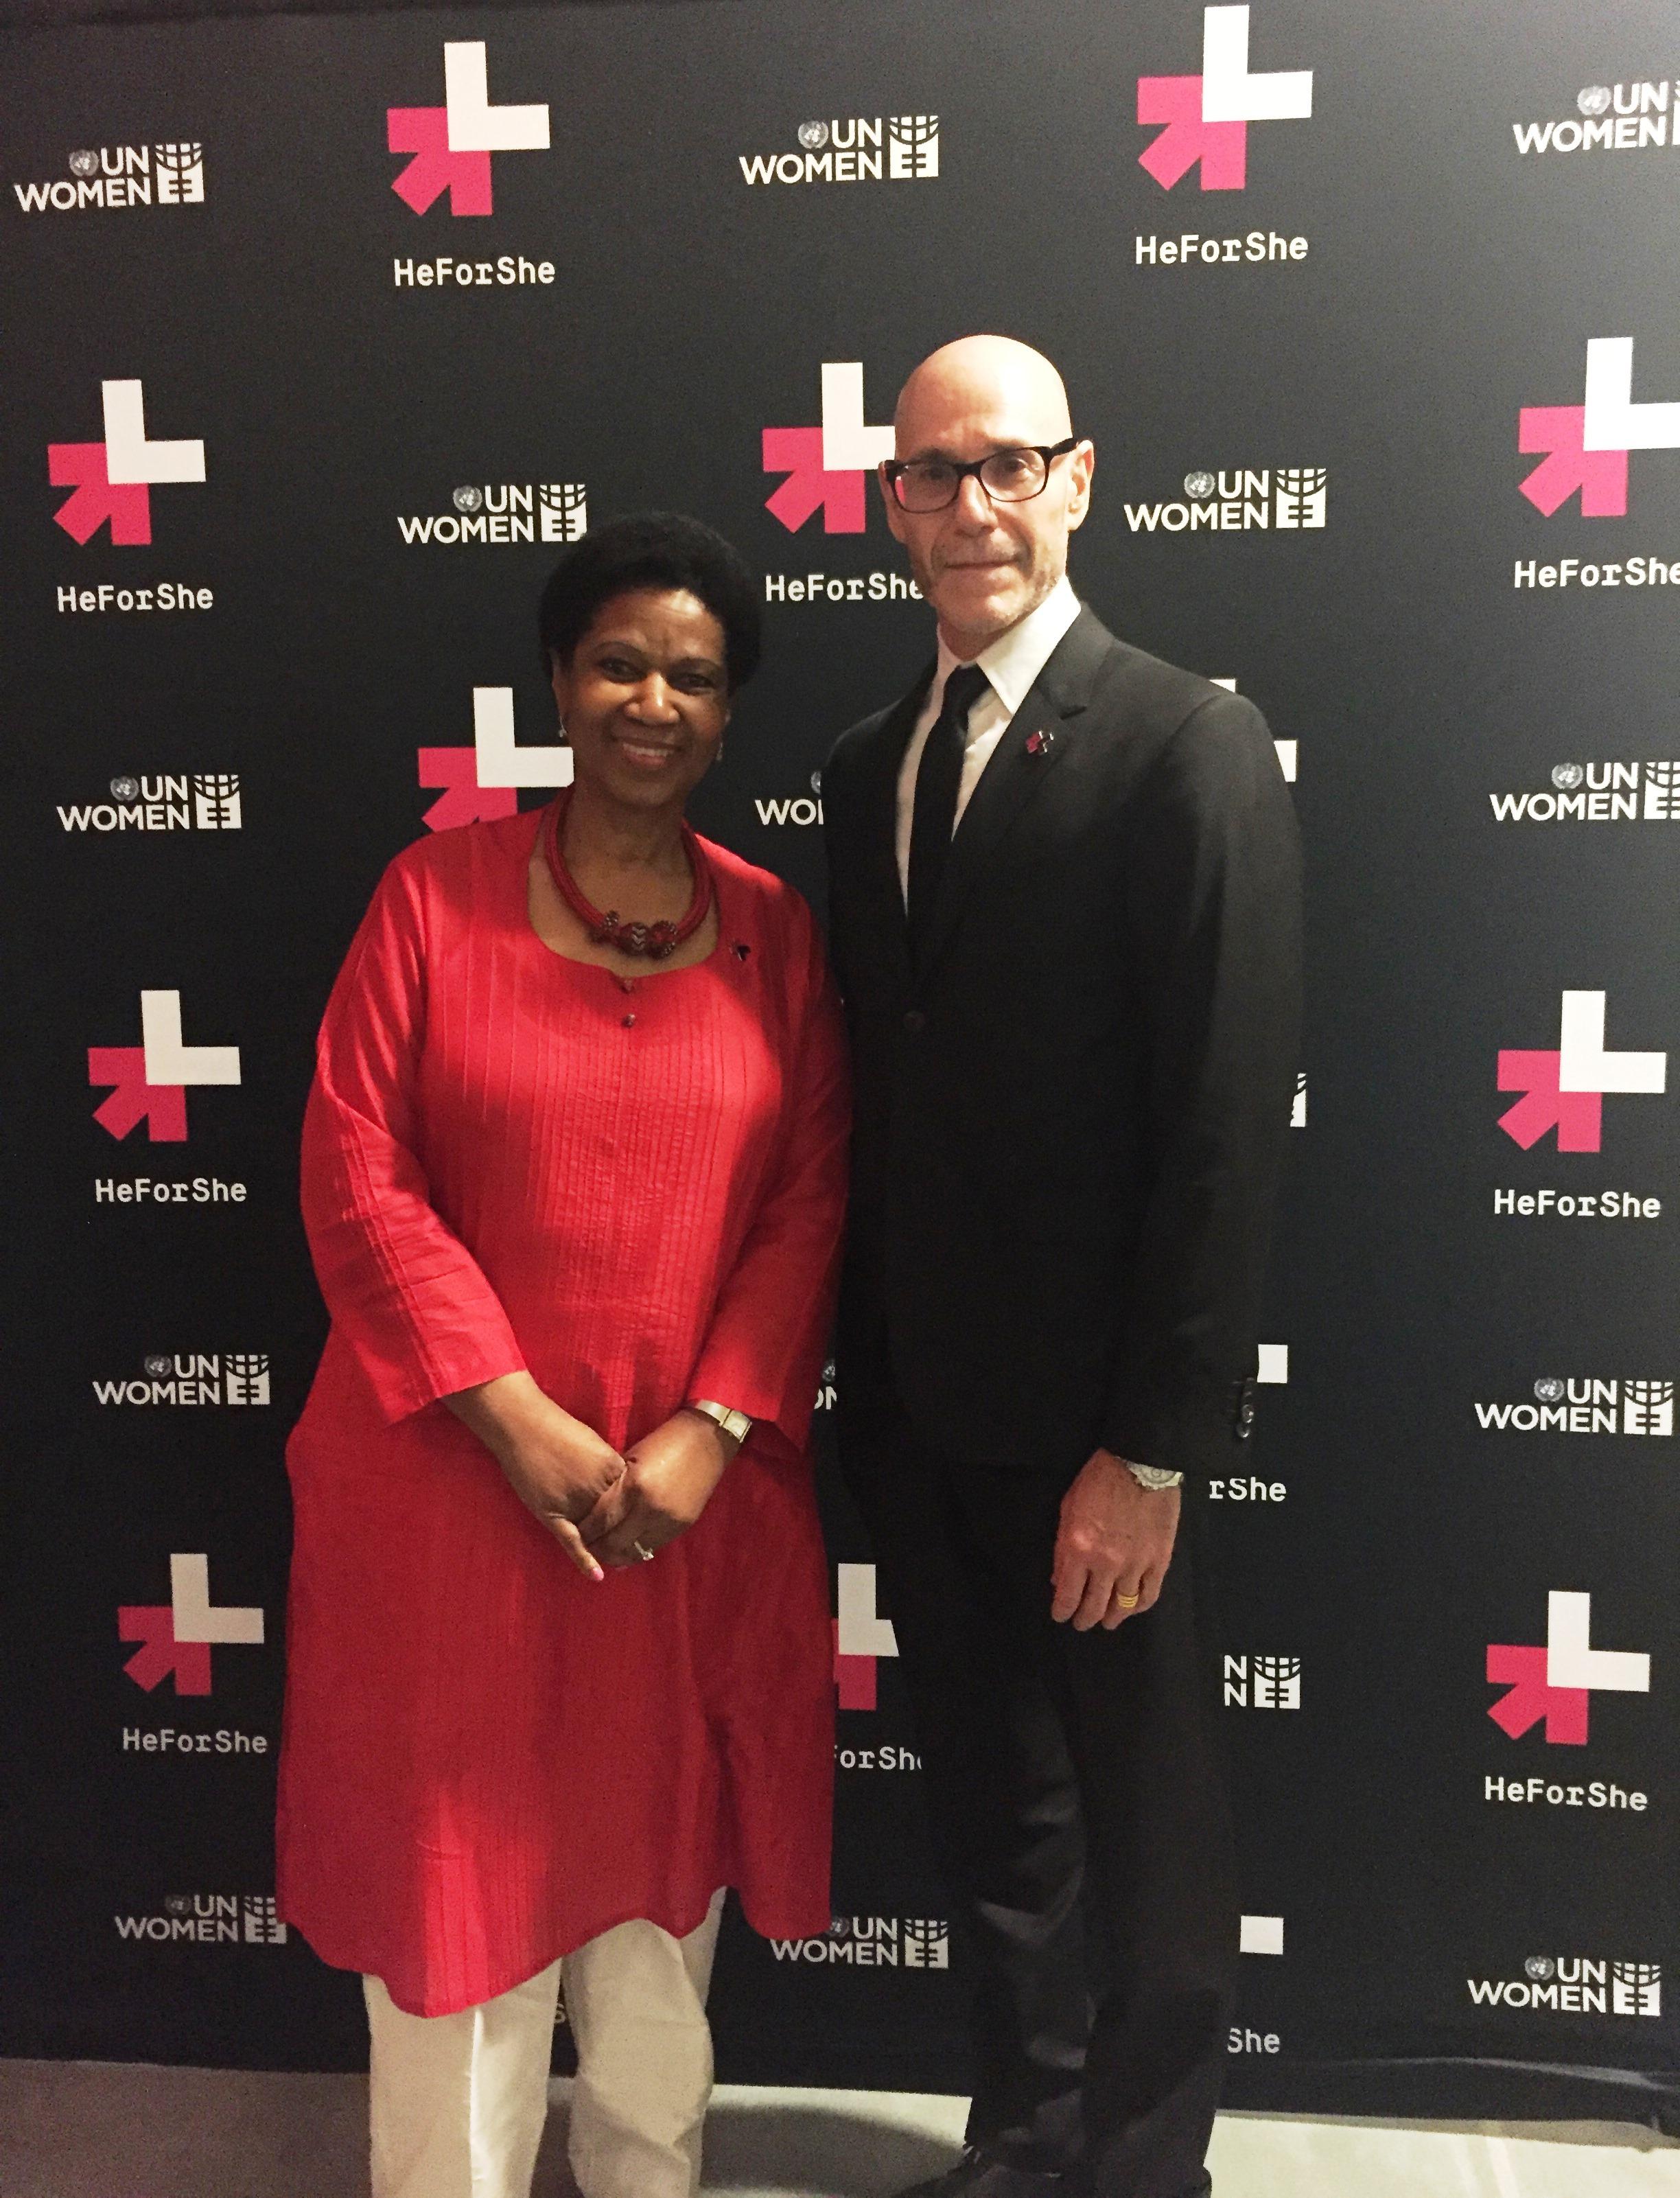 Steve Shiffman, CEO of Calvin Klein, Inc. Signs Women's Empowerment Principles Charter of UN Women (Photo: Business Wire)